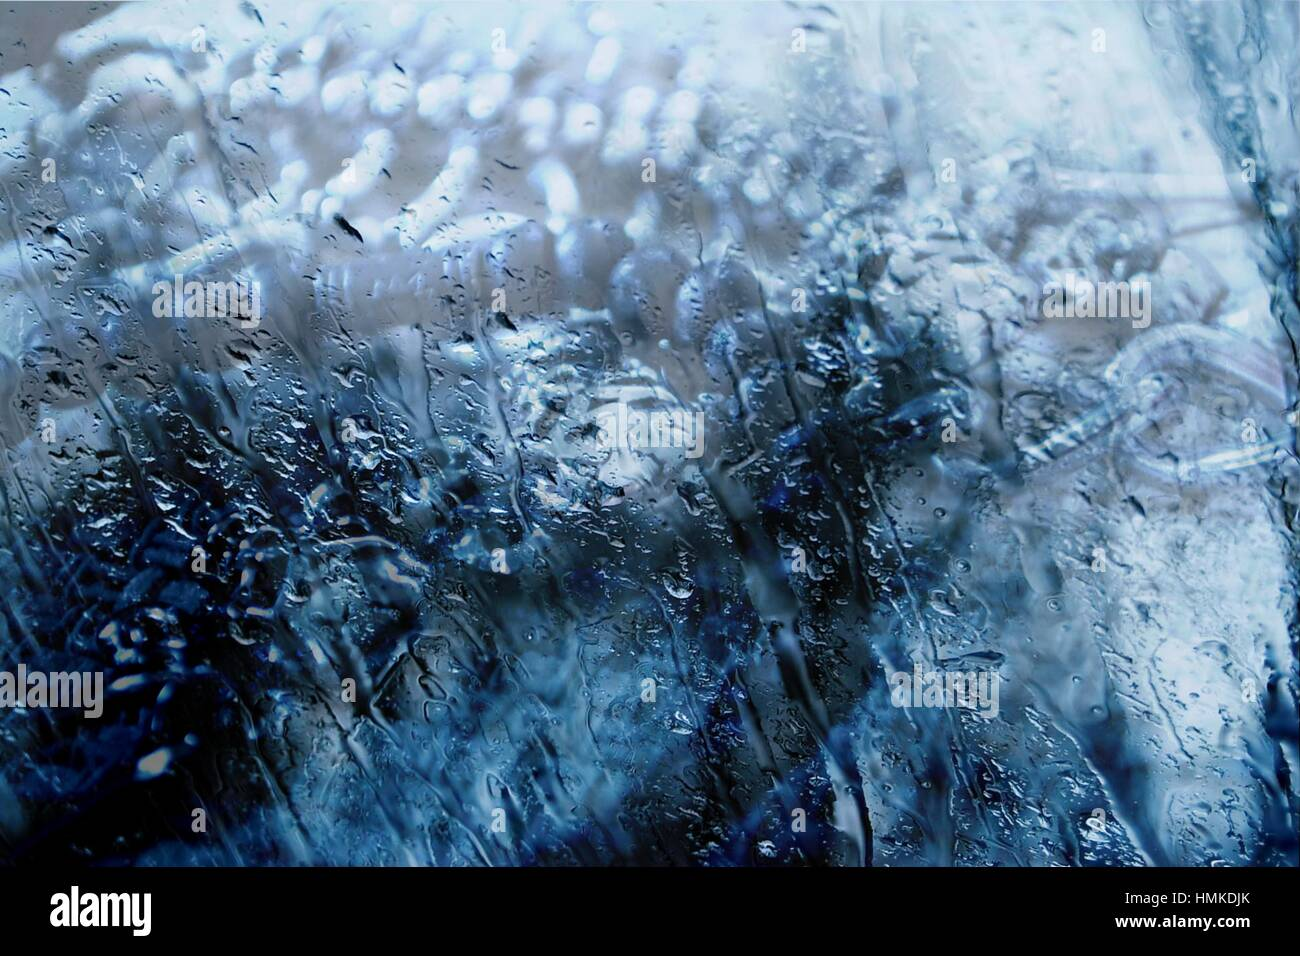 Bracelets Behind Wetness - Stock Image